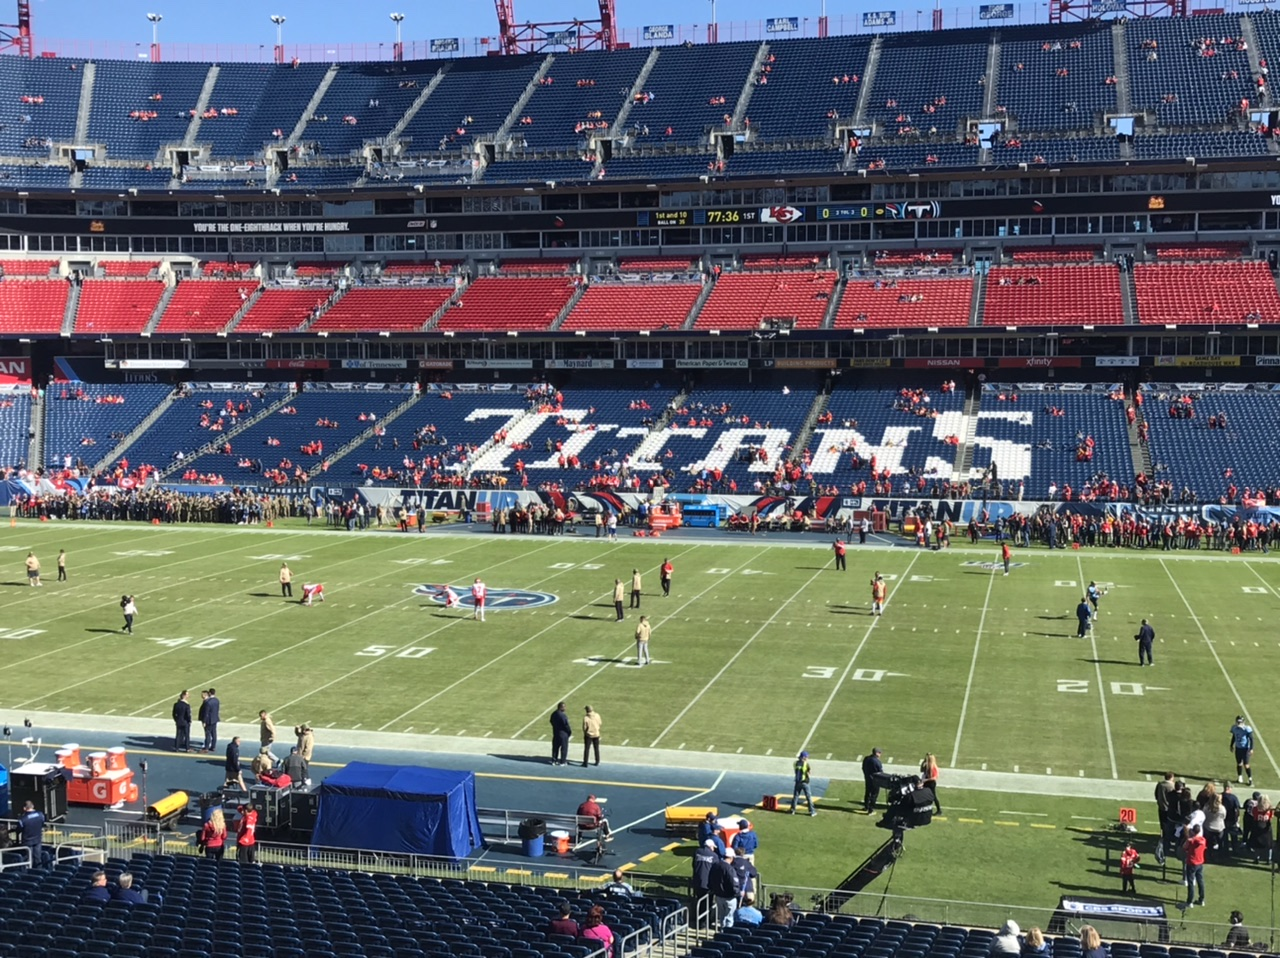 Game Day Live: Chiefs QB Patrick Mahomes Returns to Starting Lineup vs. Titans